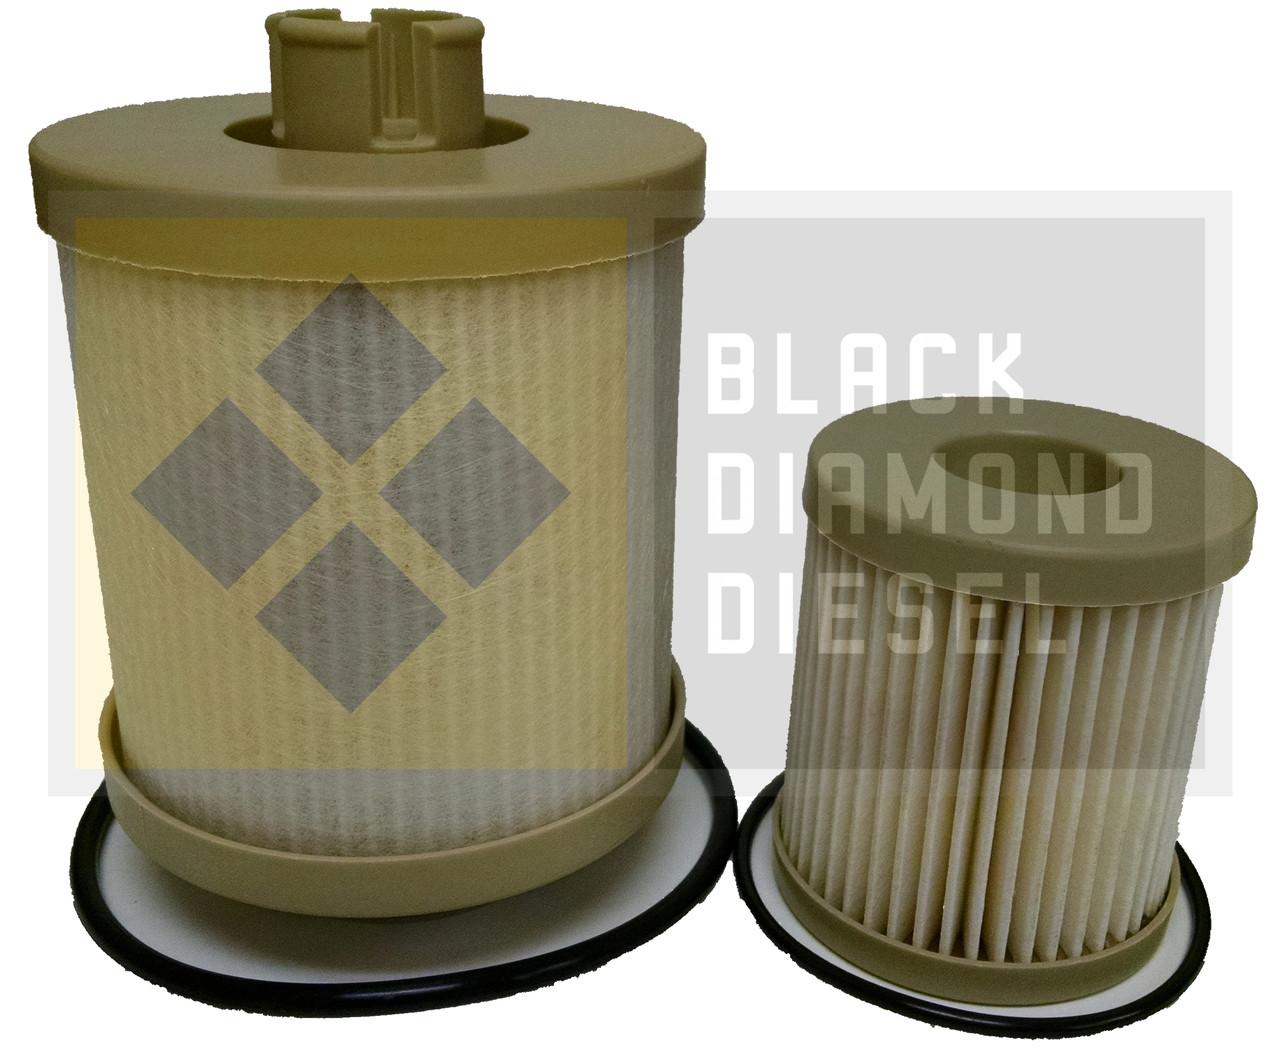 prime guard fuel filter fits 2003 2007 ford superduty 6 0 powerstroke diesel bdspdf55590 [ 1280 x 1058 Pixel ]